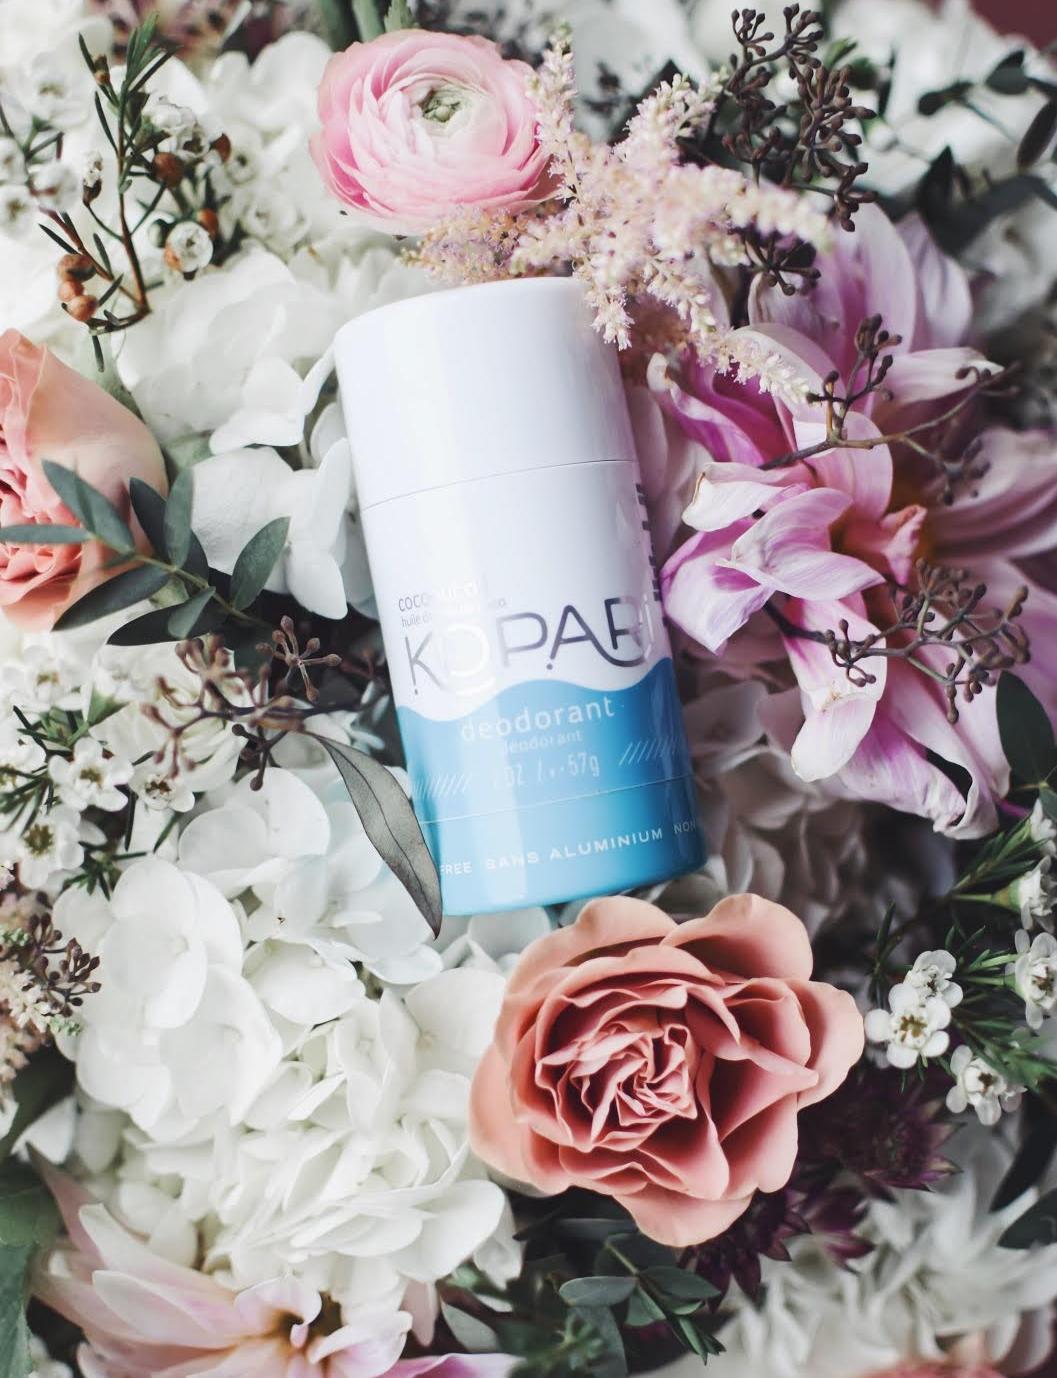 The Natural Deodorant I've Been Loving | Pine Barren Beauty | kopari coconut deodorant